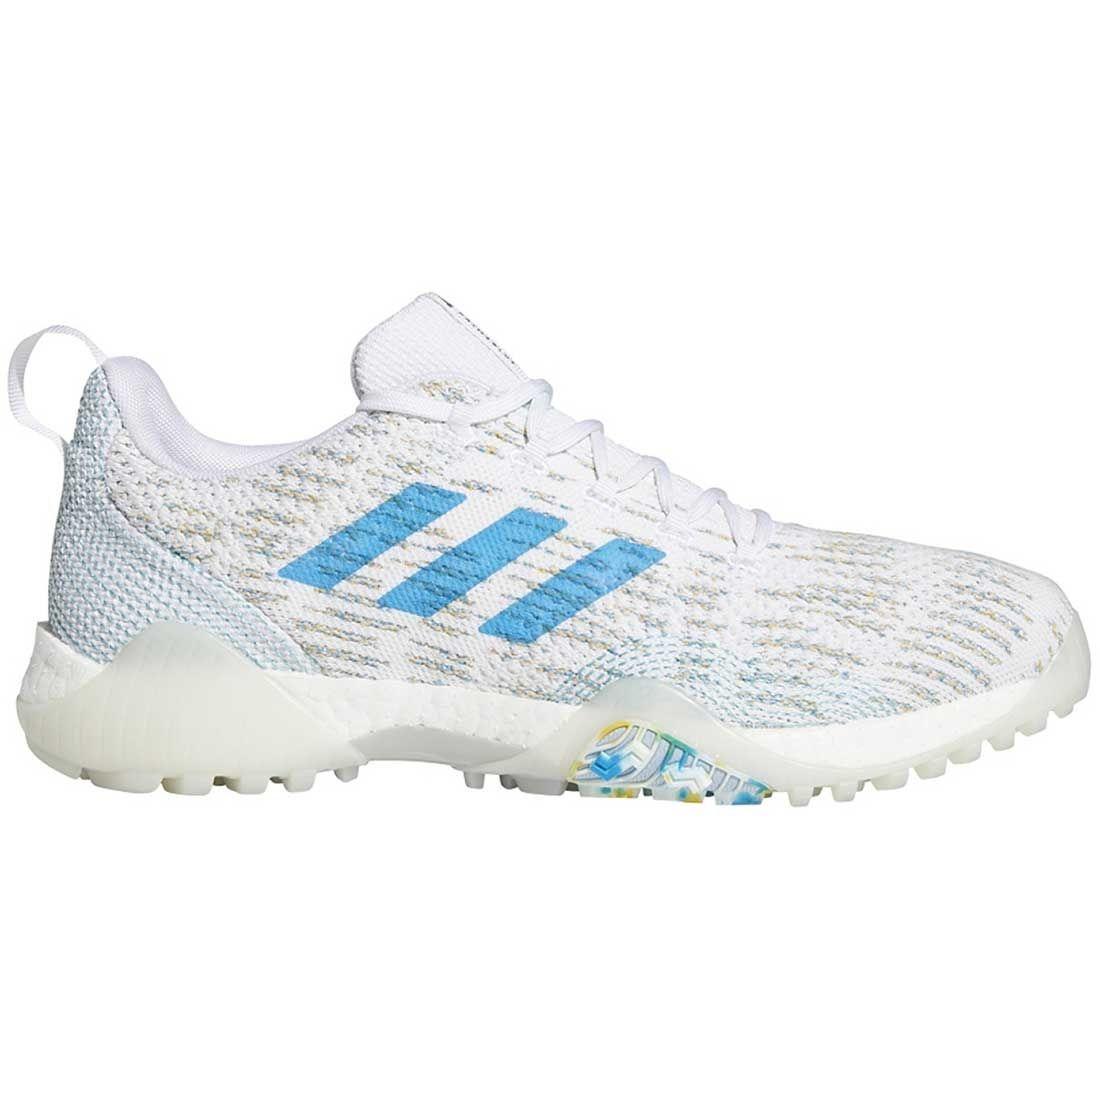 Buy Adidas Codechaos Primeblue Golf Shoes White Sharp Blue Golf Discount